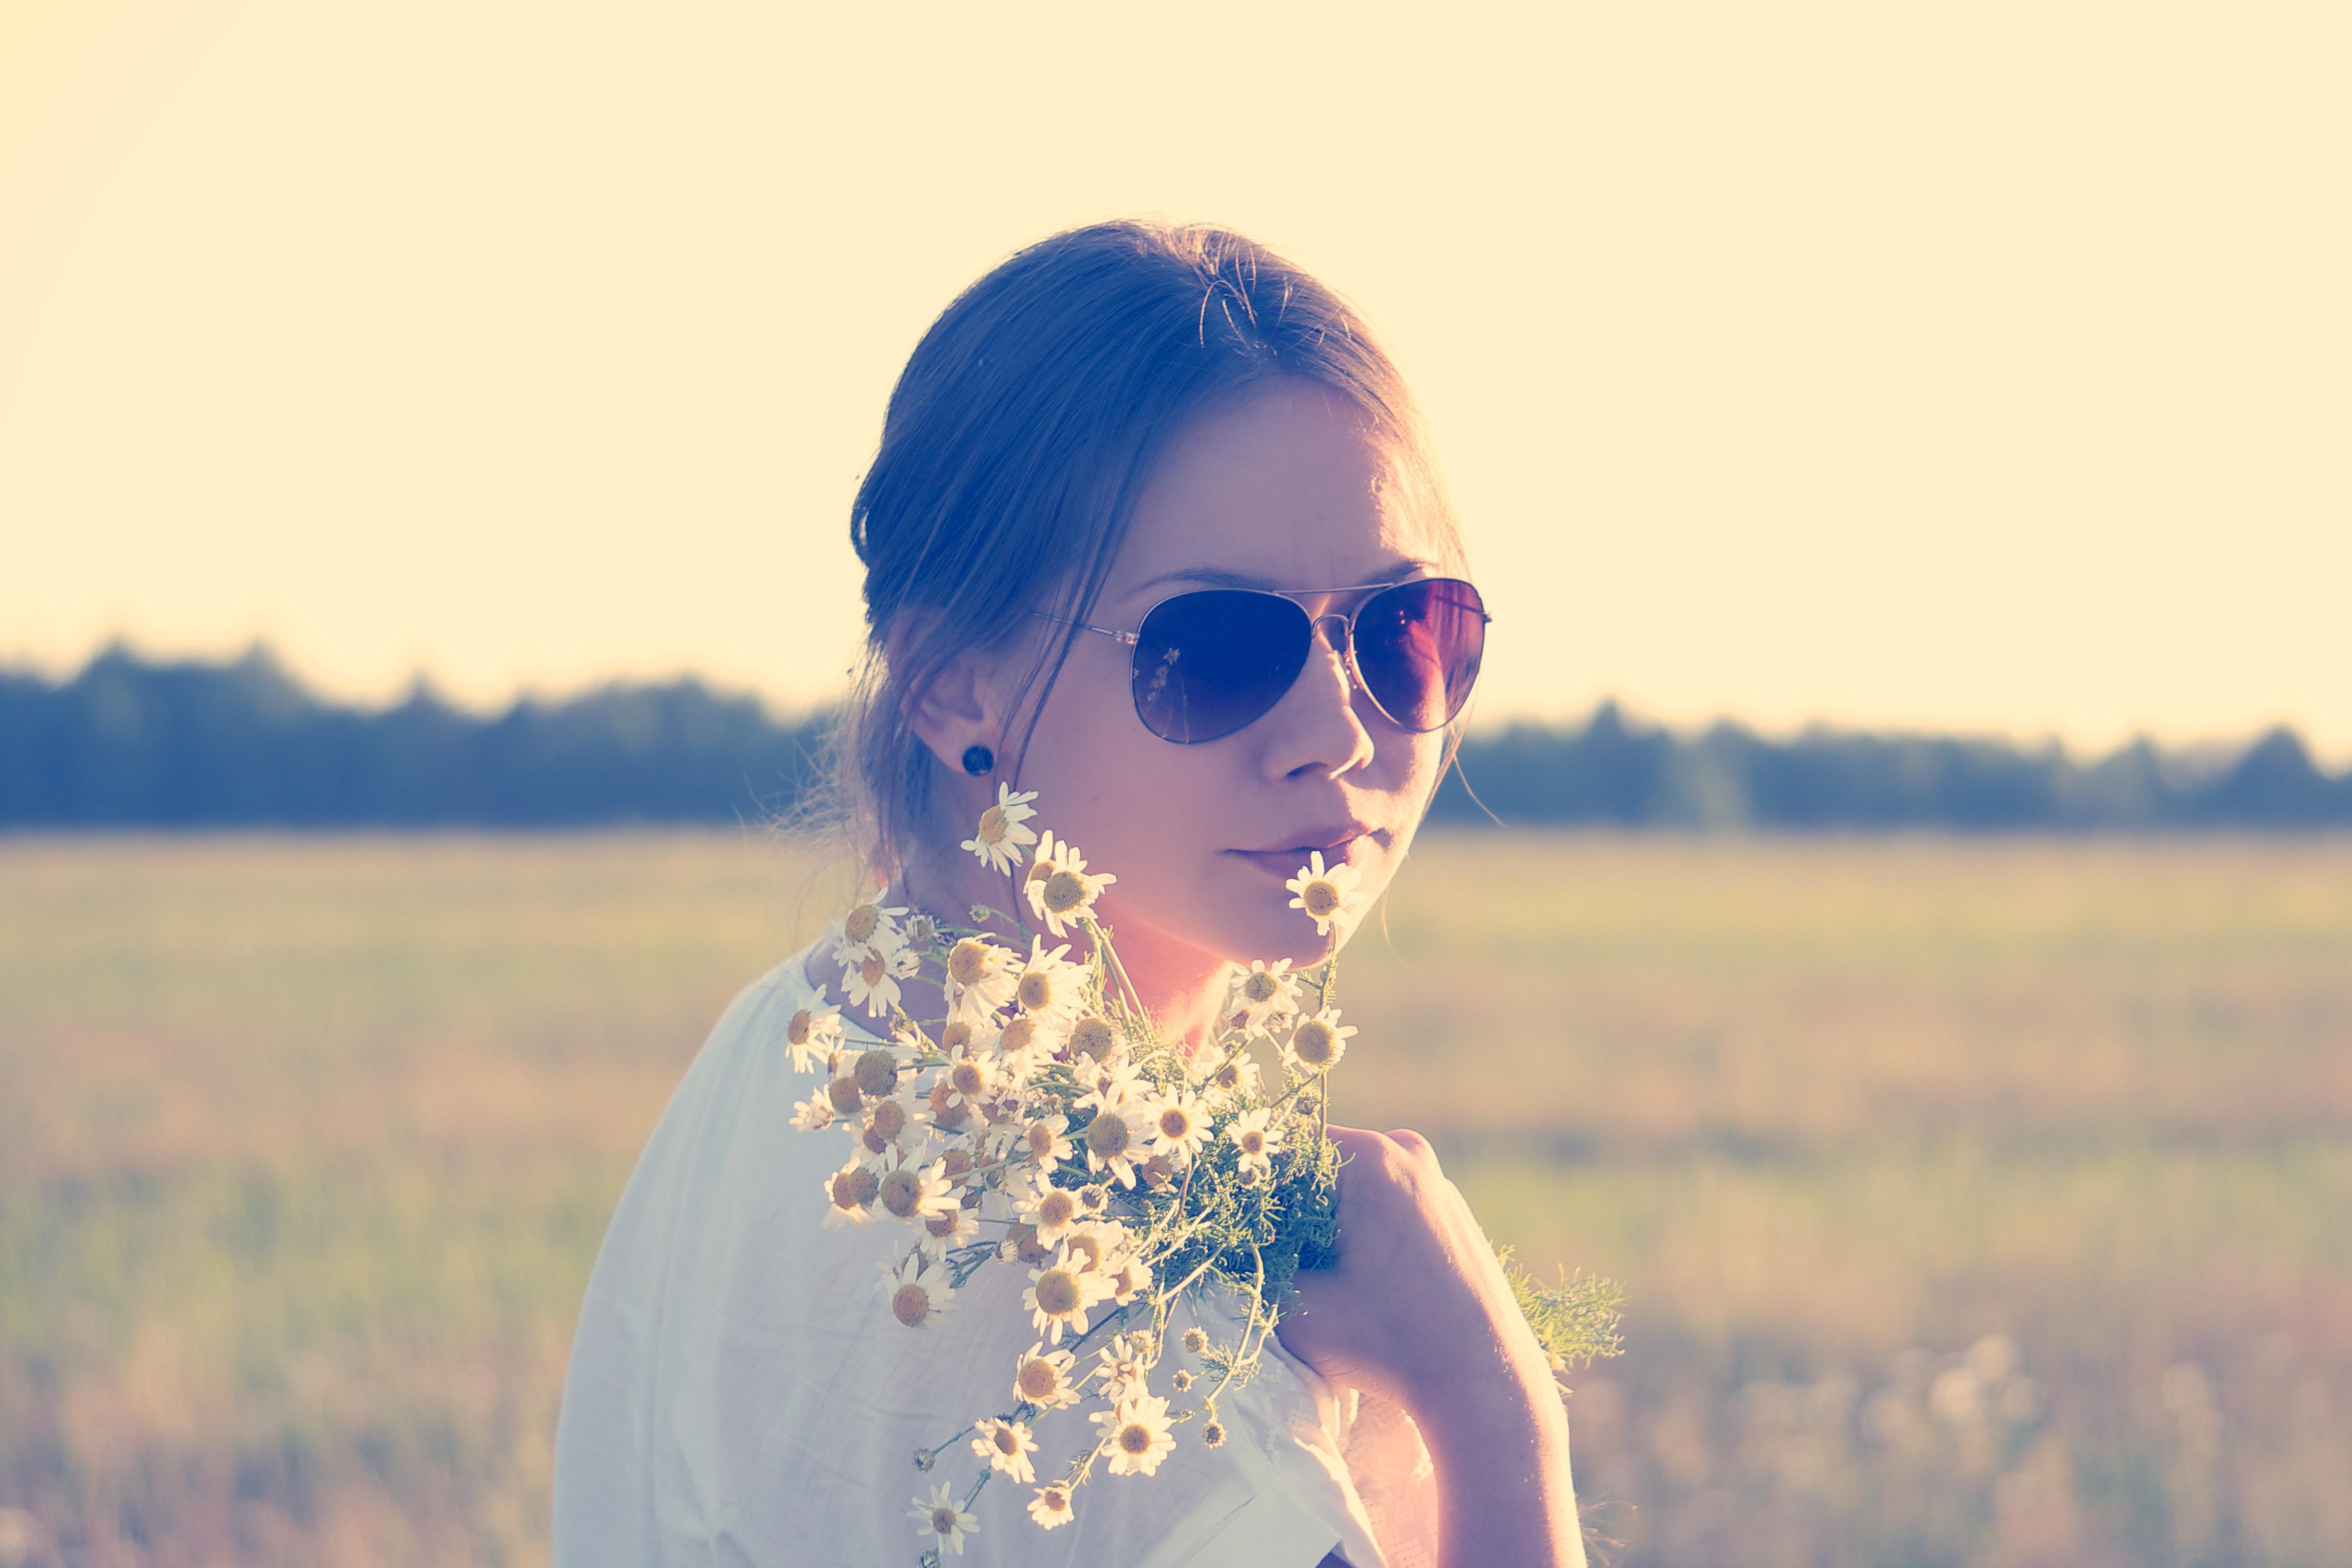 Free Images Girl Woman Hair Sunlight Flower Summer Daisy Love Model Spring Color Blue Lady Season Smile Flowers Focus Dress Sunglasses Eye Glasses Photograph Skin Eyewear Beauty Beautiful Attractive Emotion Blouse